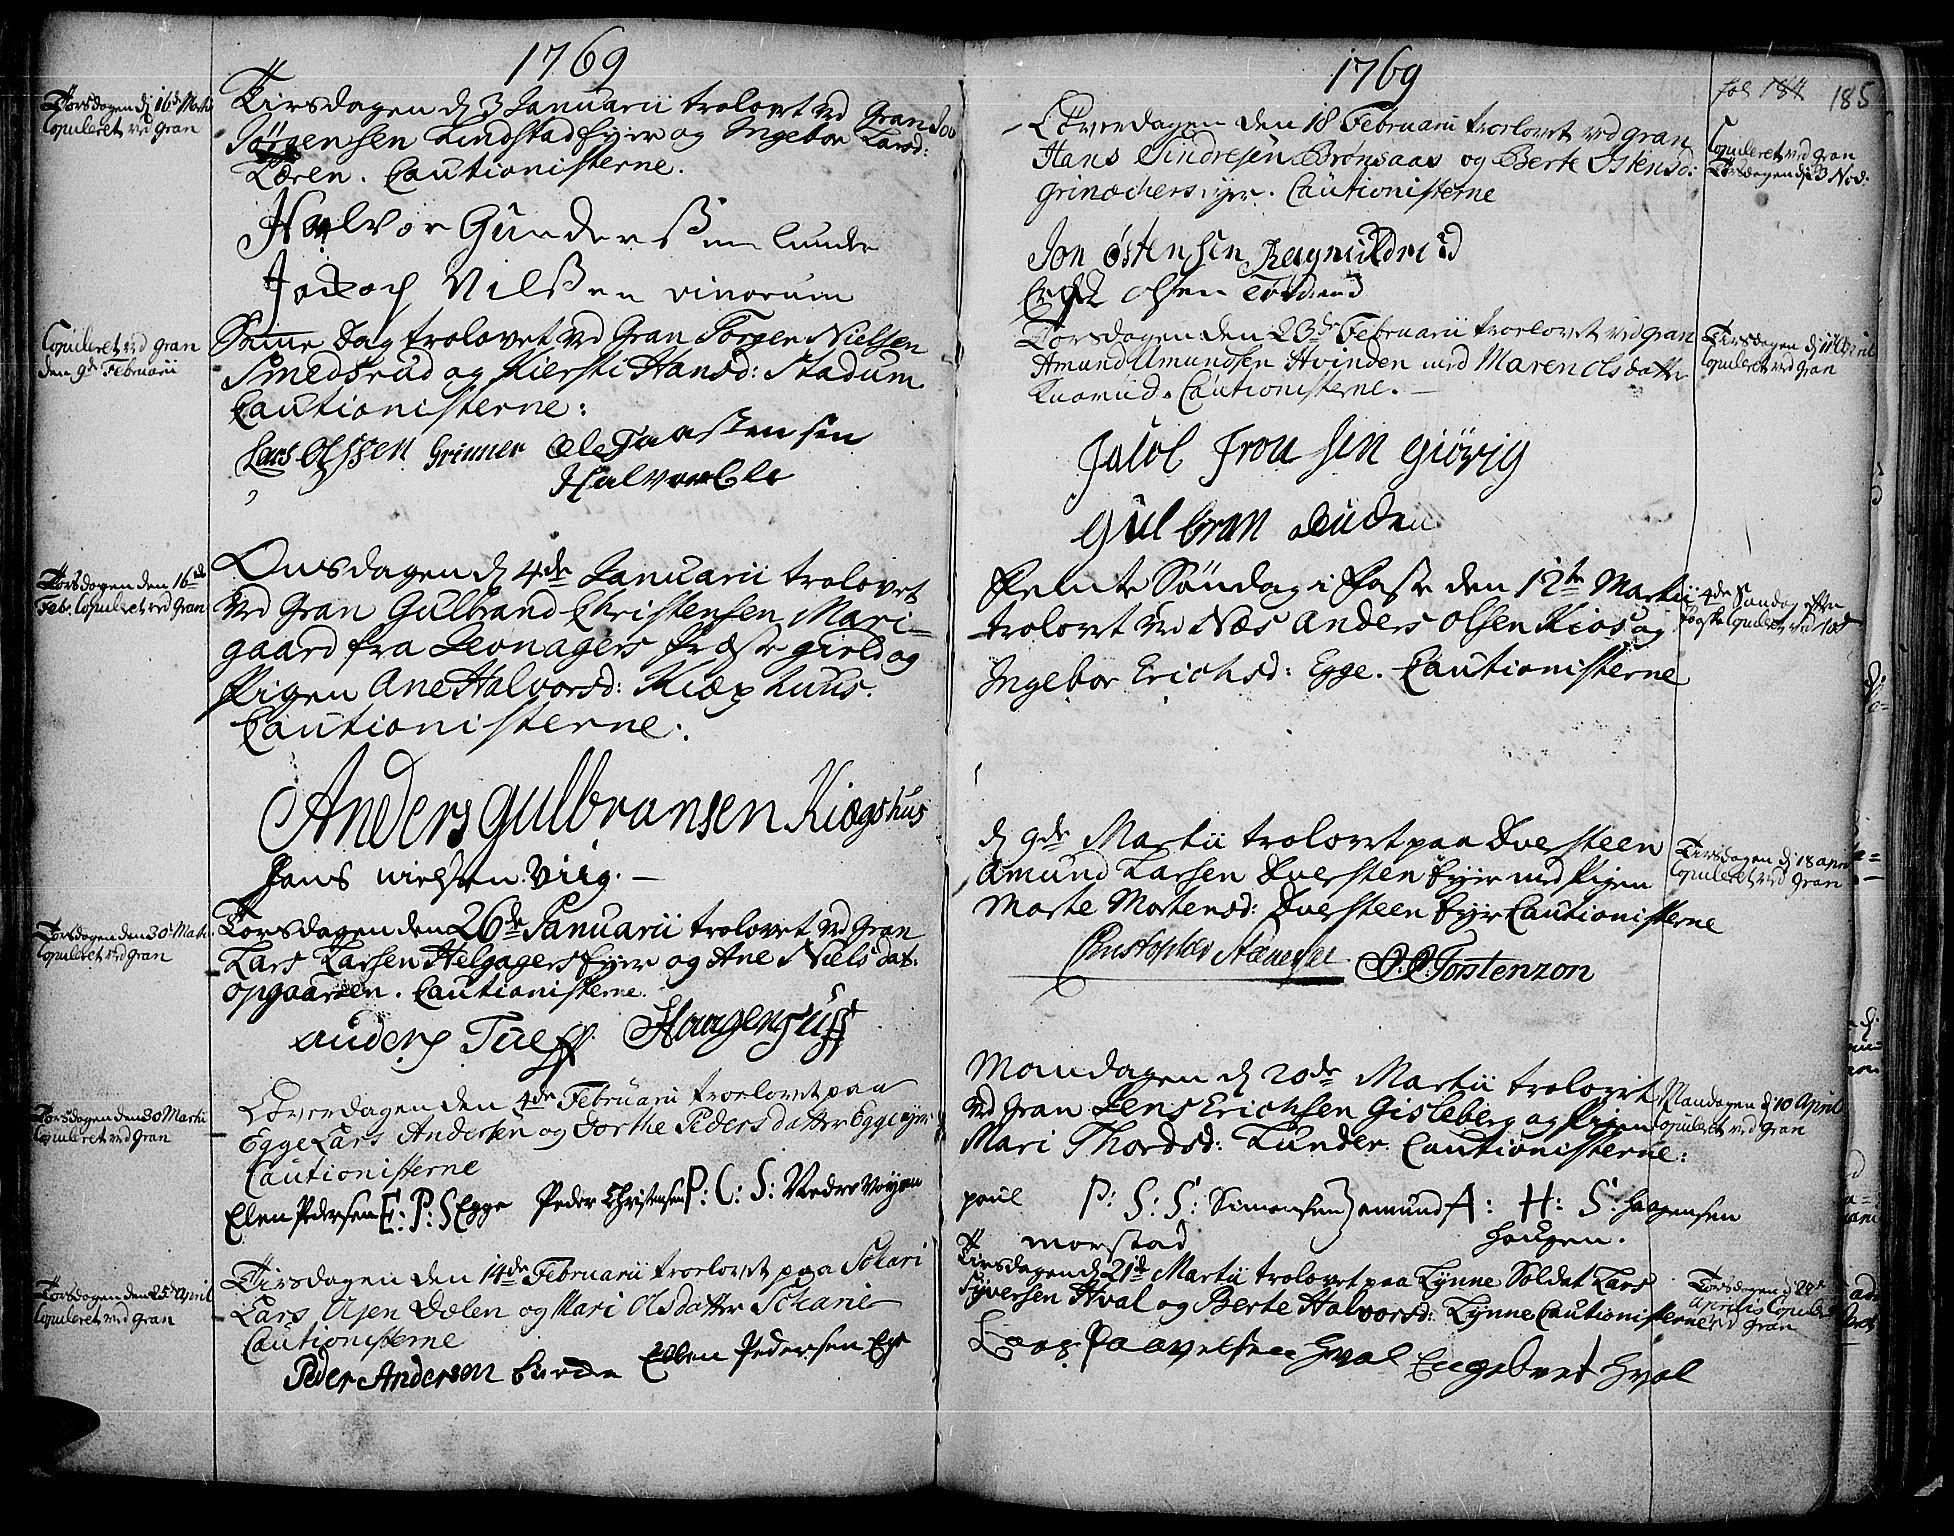 SAH, Gran prestekontor, Ministerialbok nr. 4, 1759-1775, s. 185